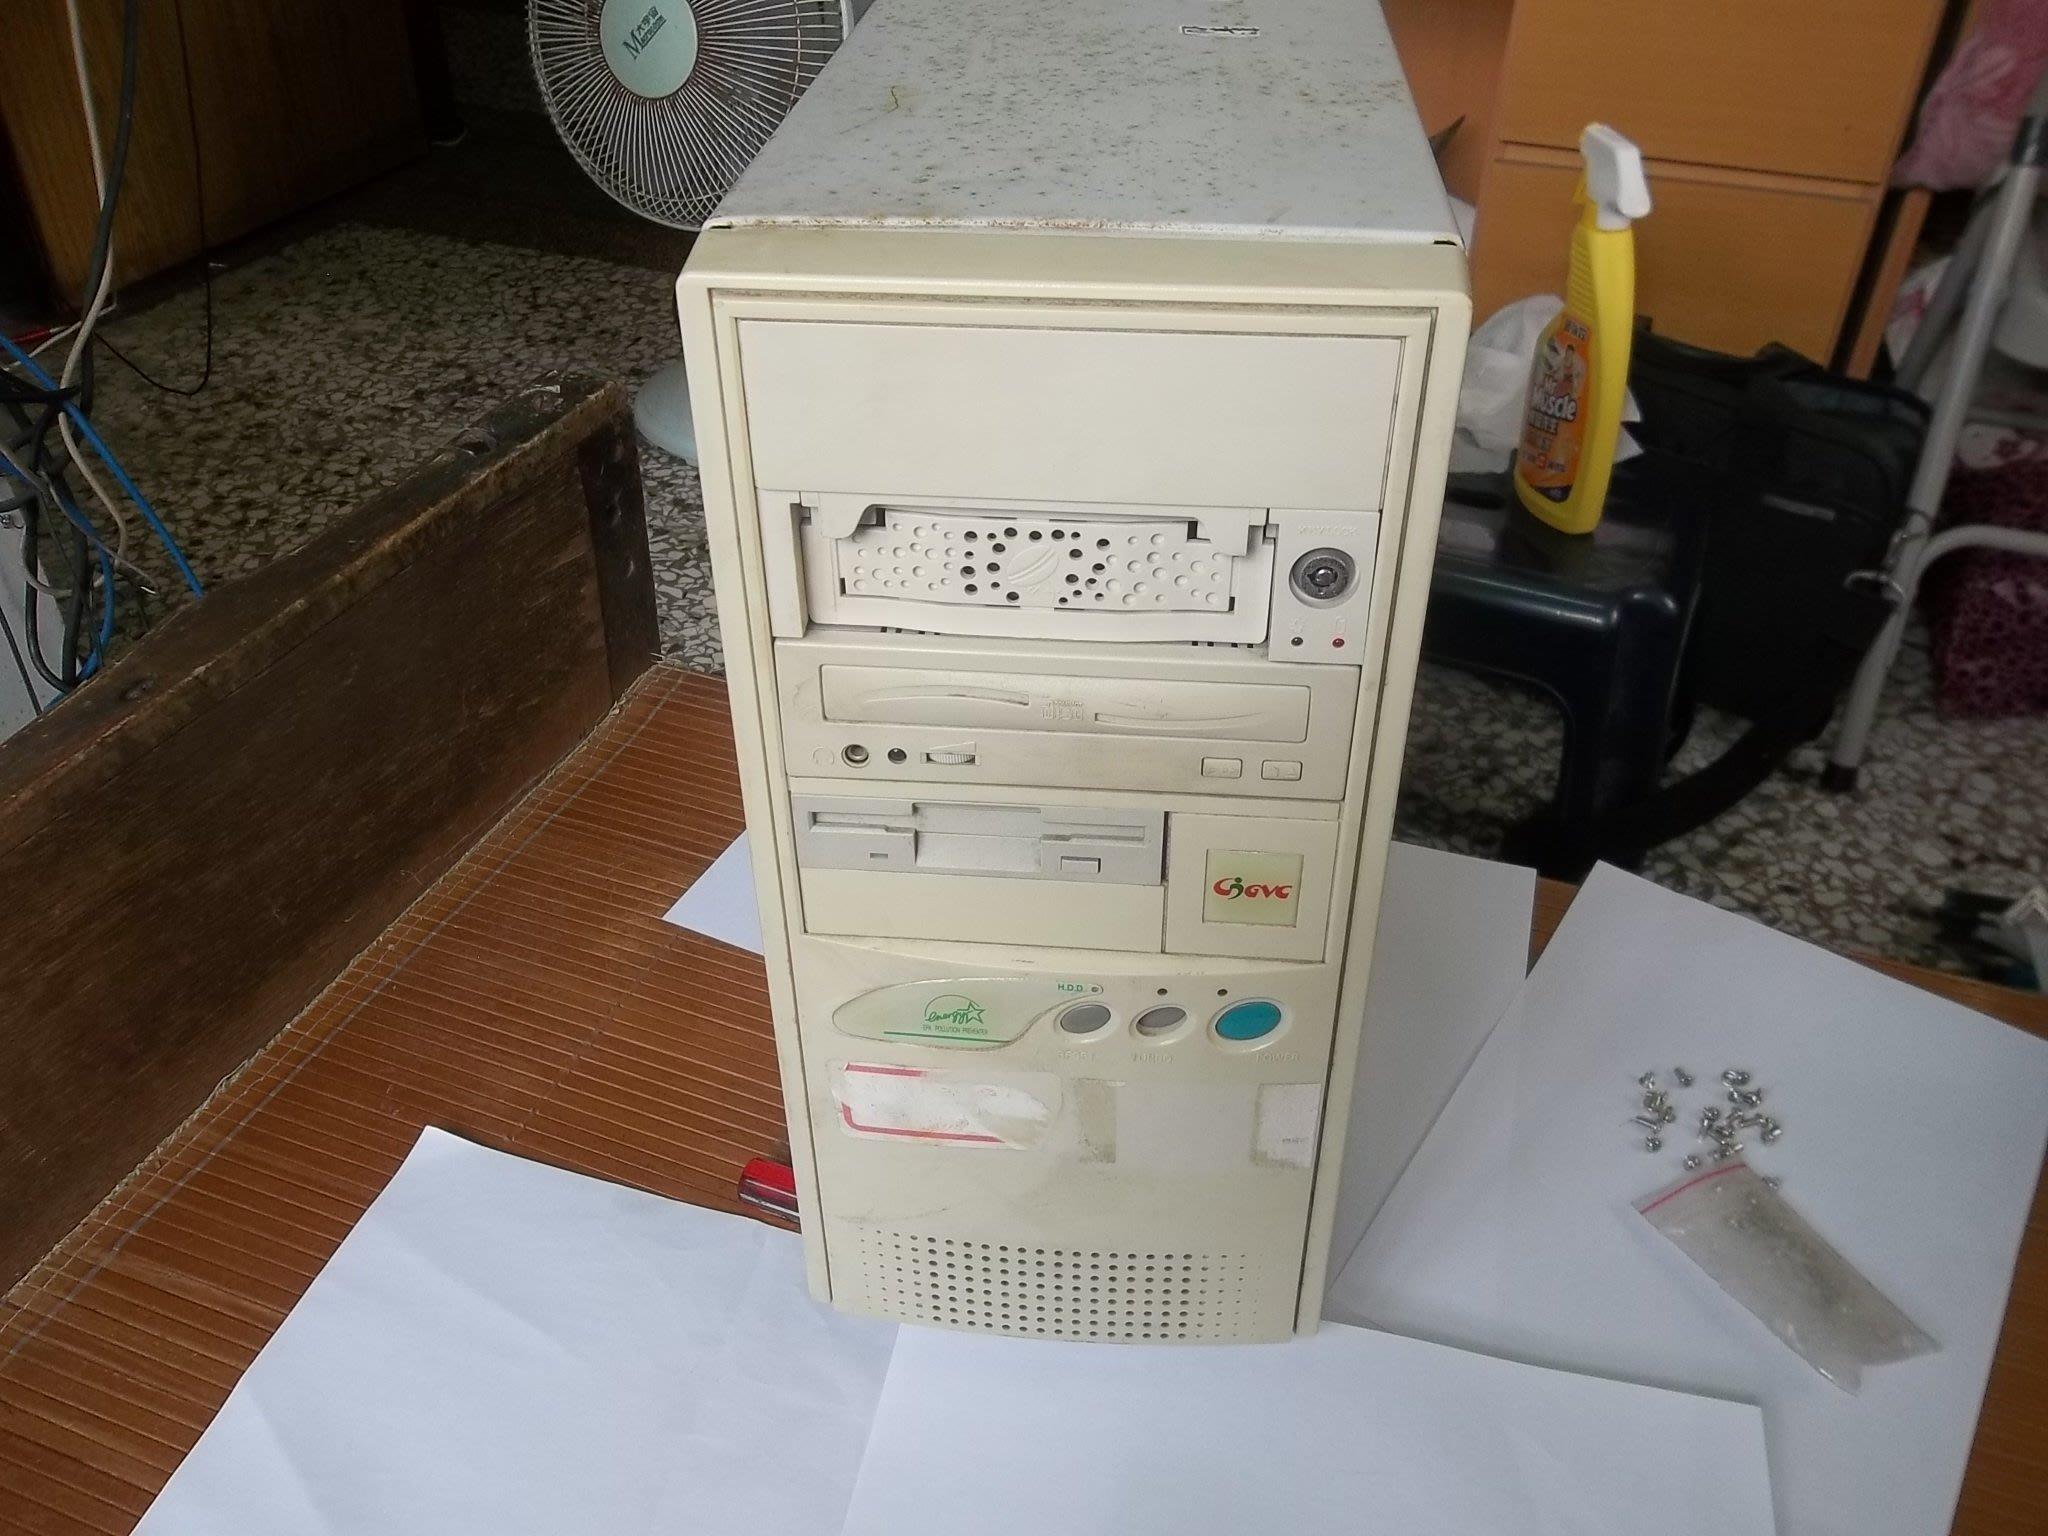 PENTIUM-166電腦,華碩主機板,,大孔鍵盤,含,6.4G硬碟,DE-530網路卡,已灌好98有3組ISA,共9台